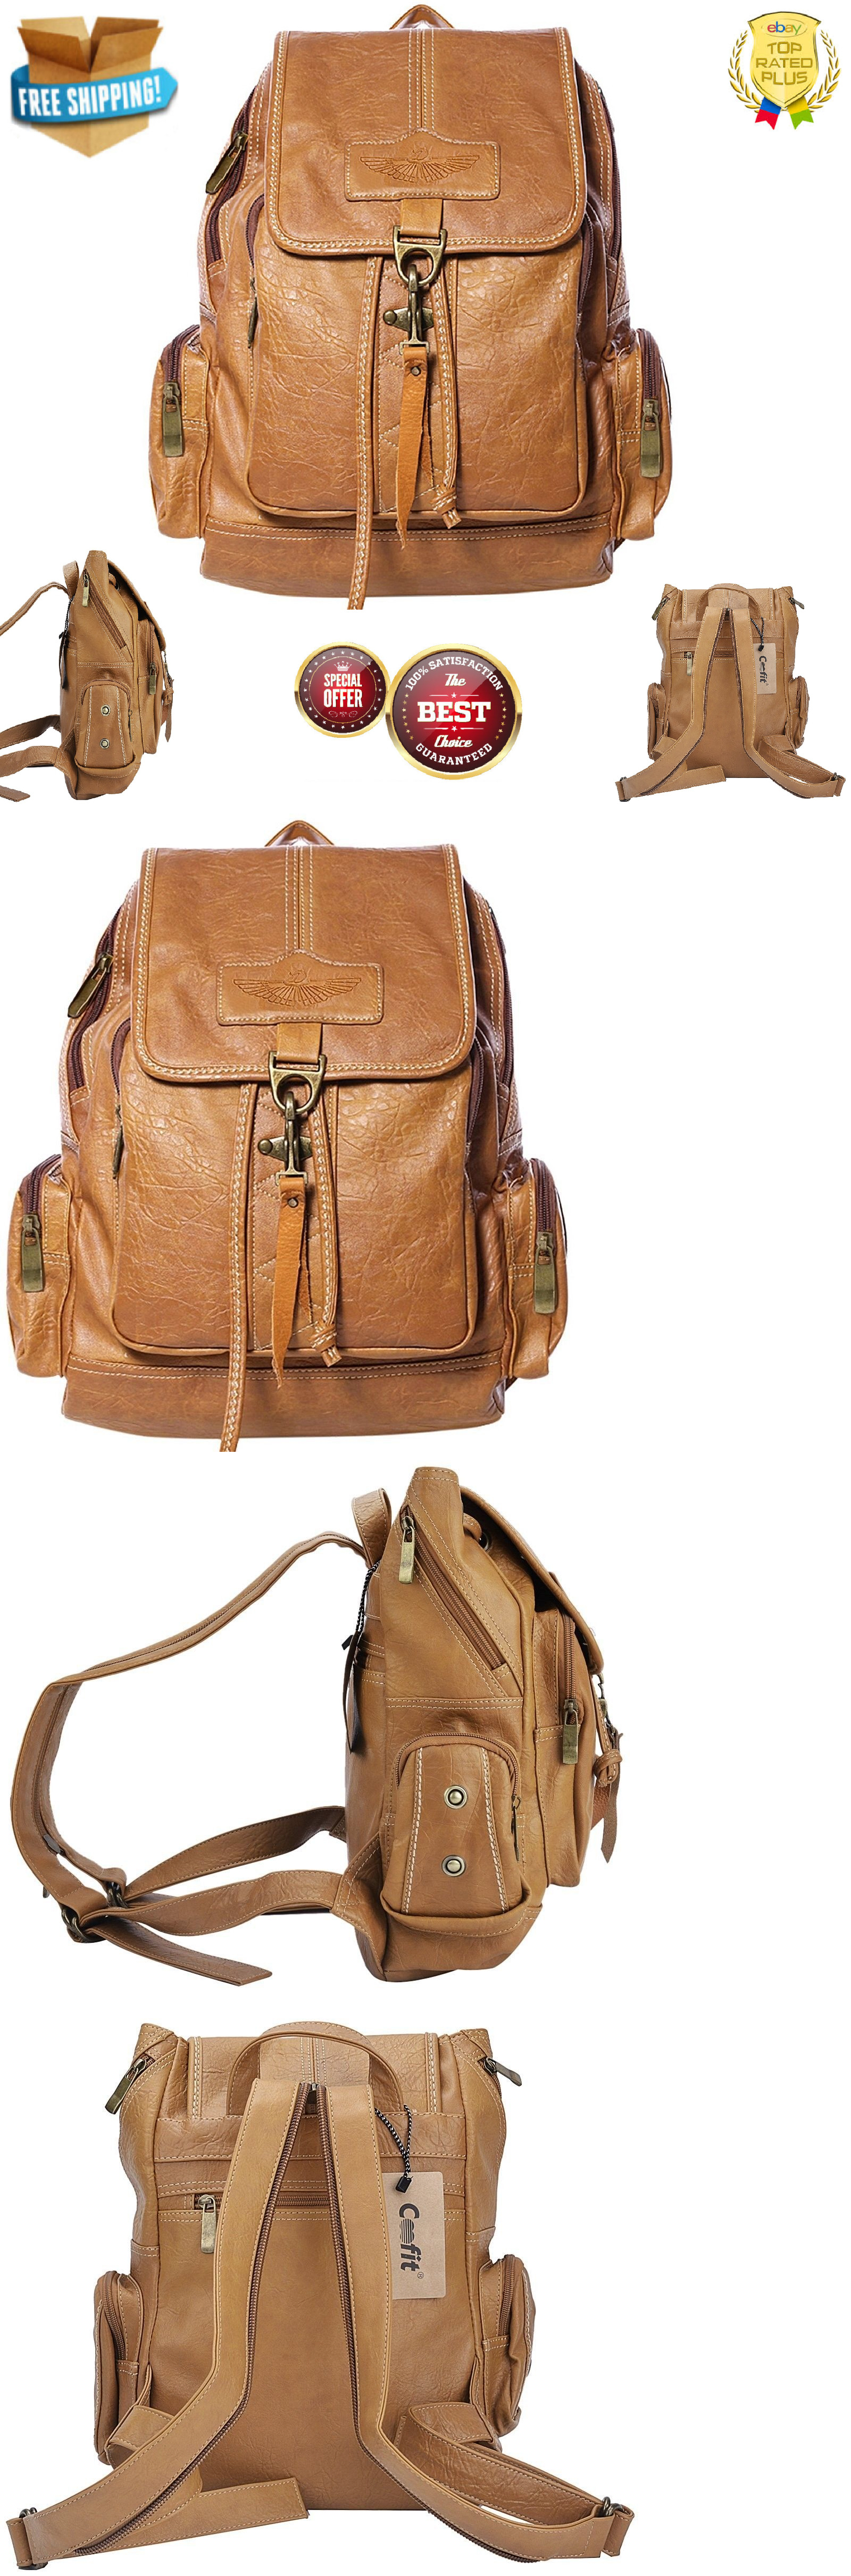 backpacks and bookbags leather bag vintage women handbag